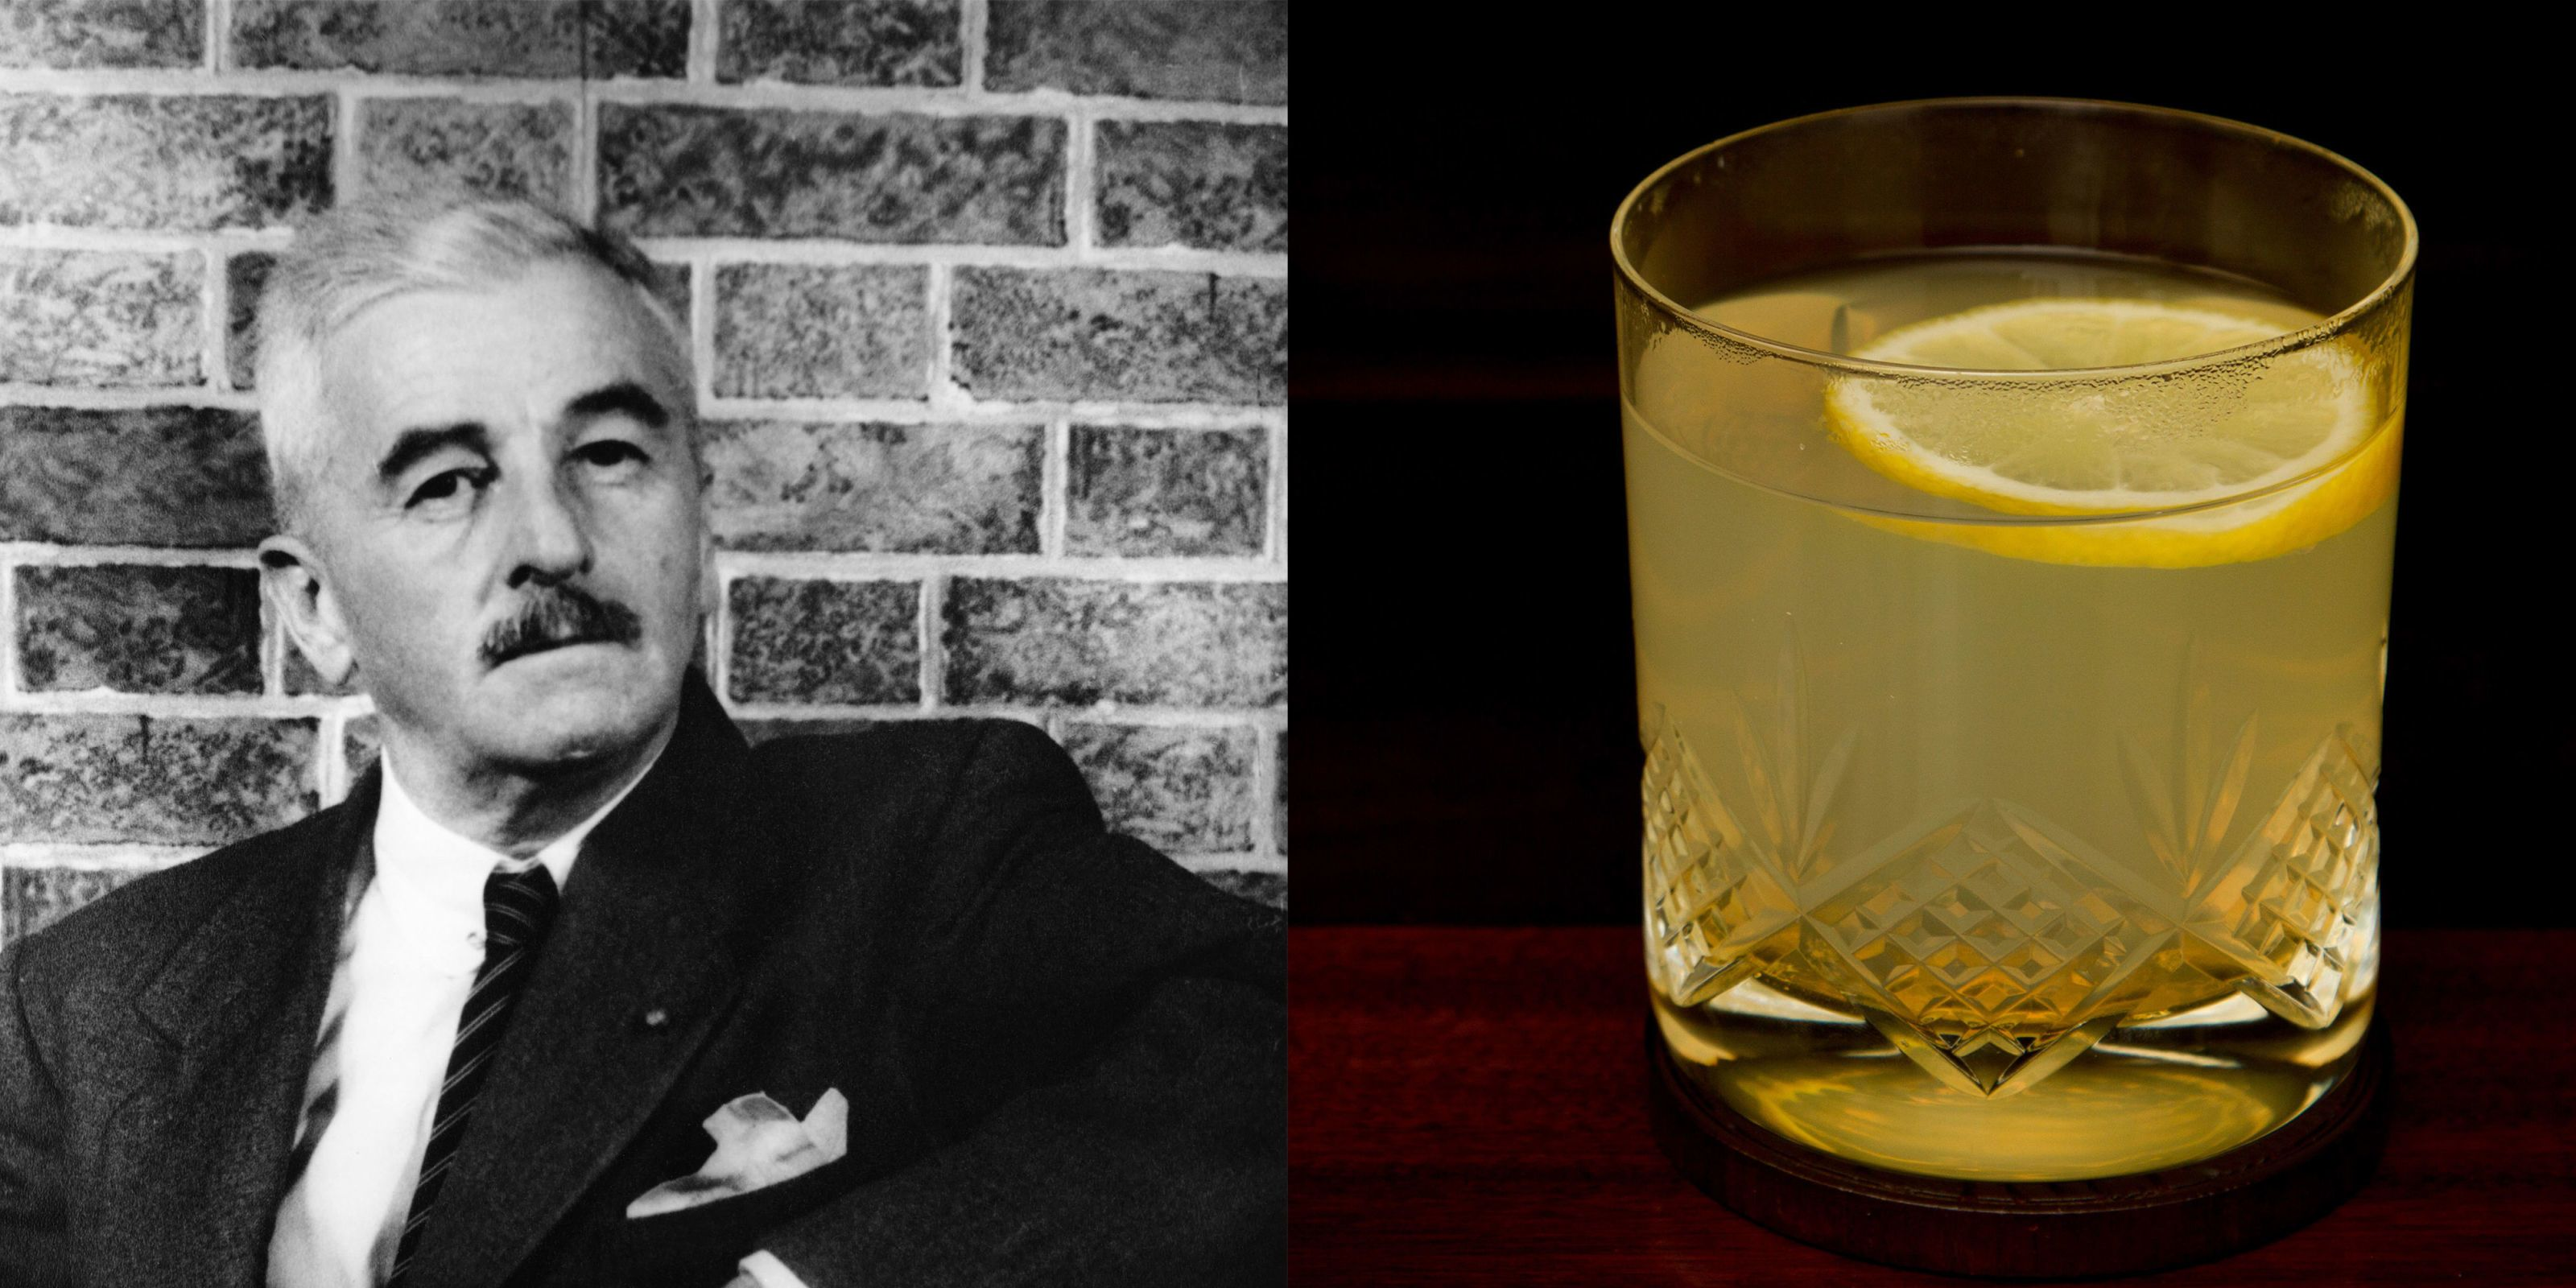 William Faulkner's Hot Toddy Recipe Is the Secret to Surviving Winter